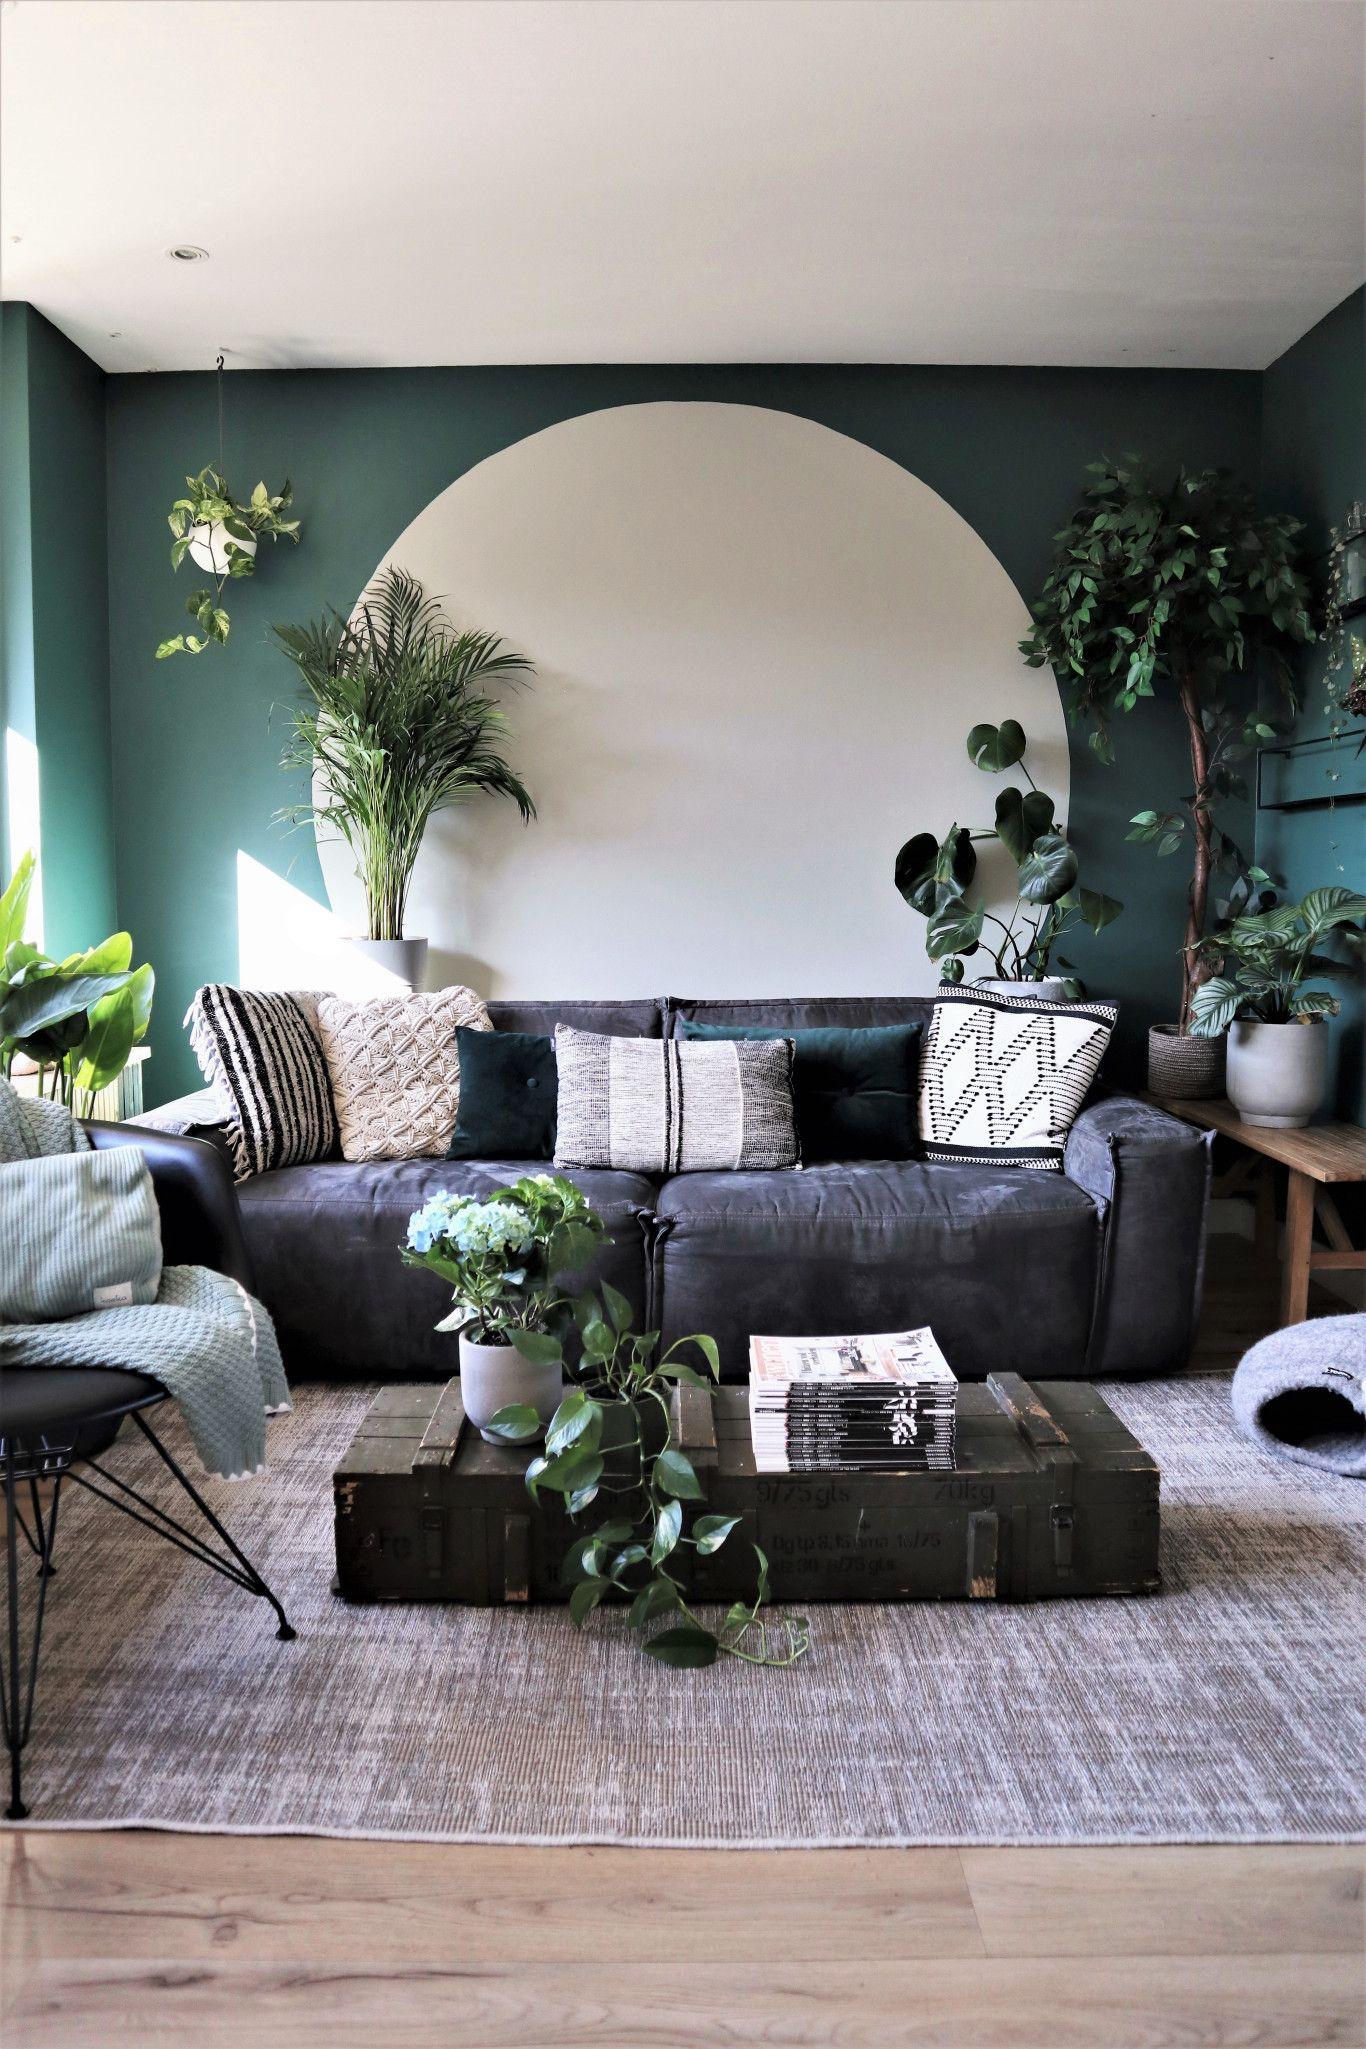 Cirkel Op De Muur Verven In 5 Simpele Stappen Interieur Lifestyle Muur Verven Thuisdecoratie Home Deco